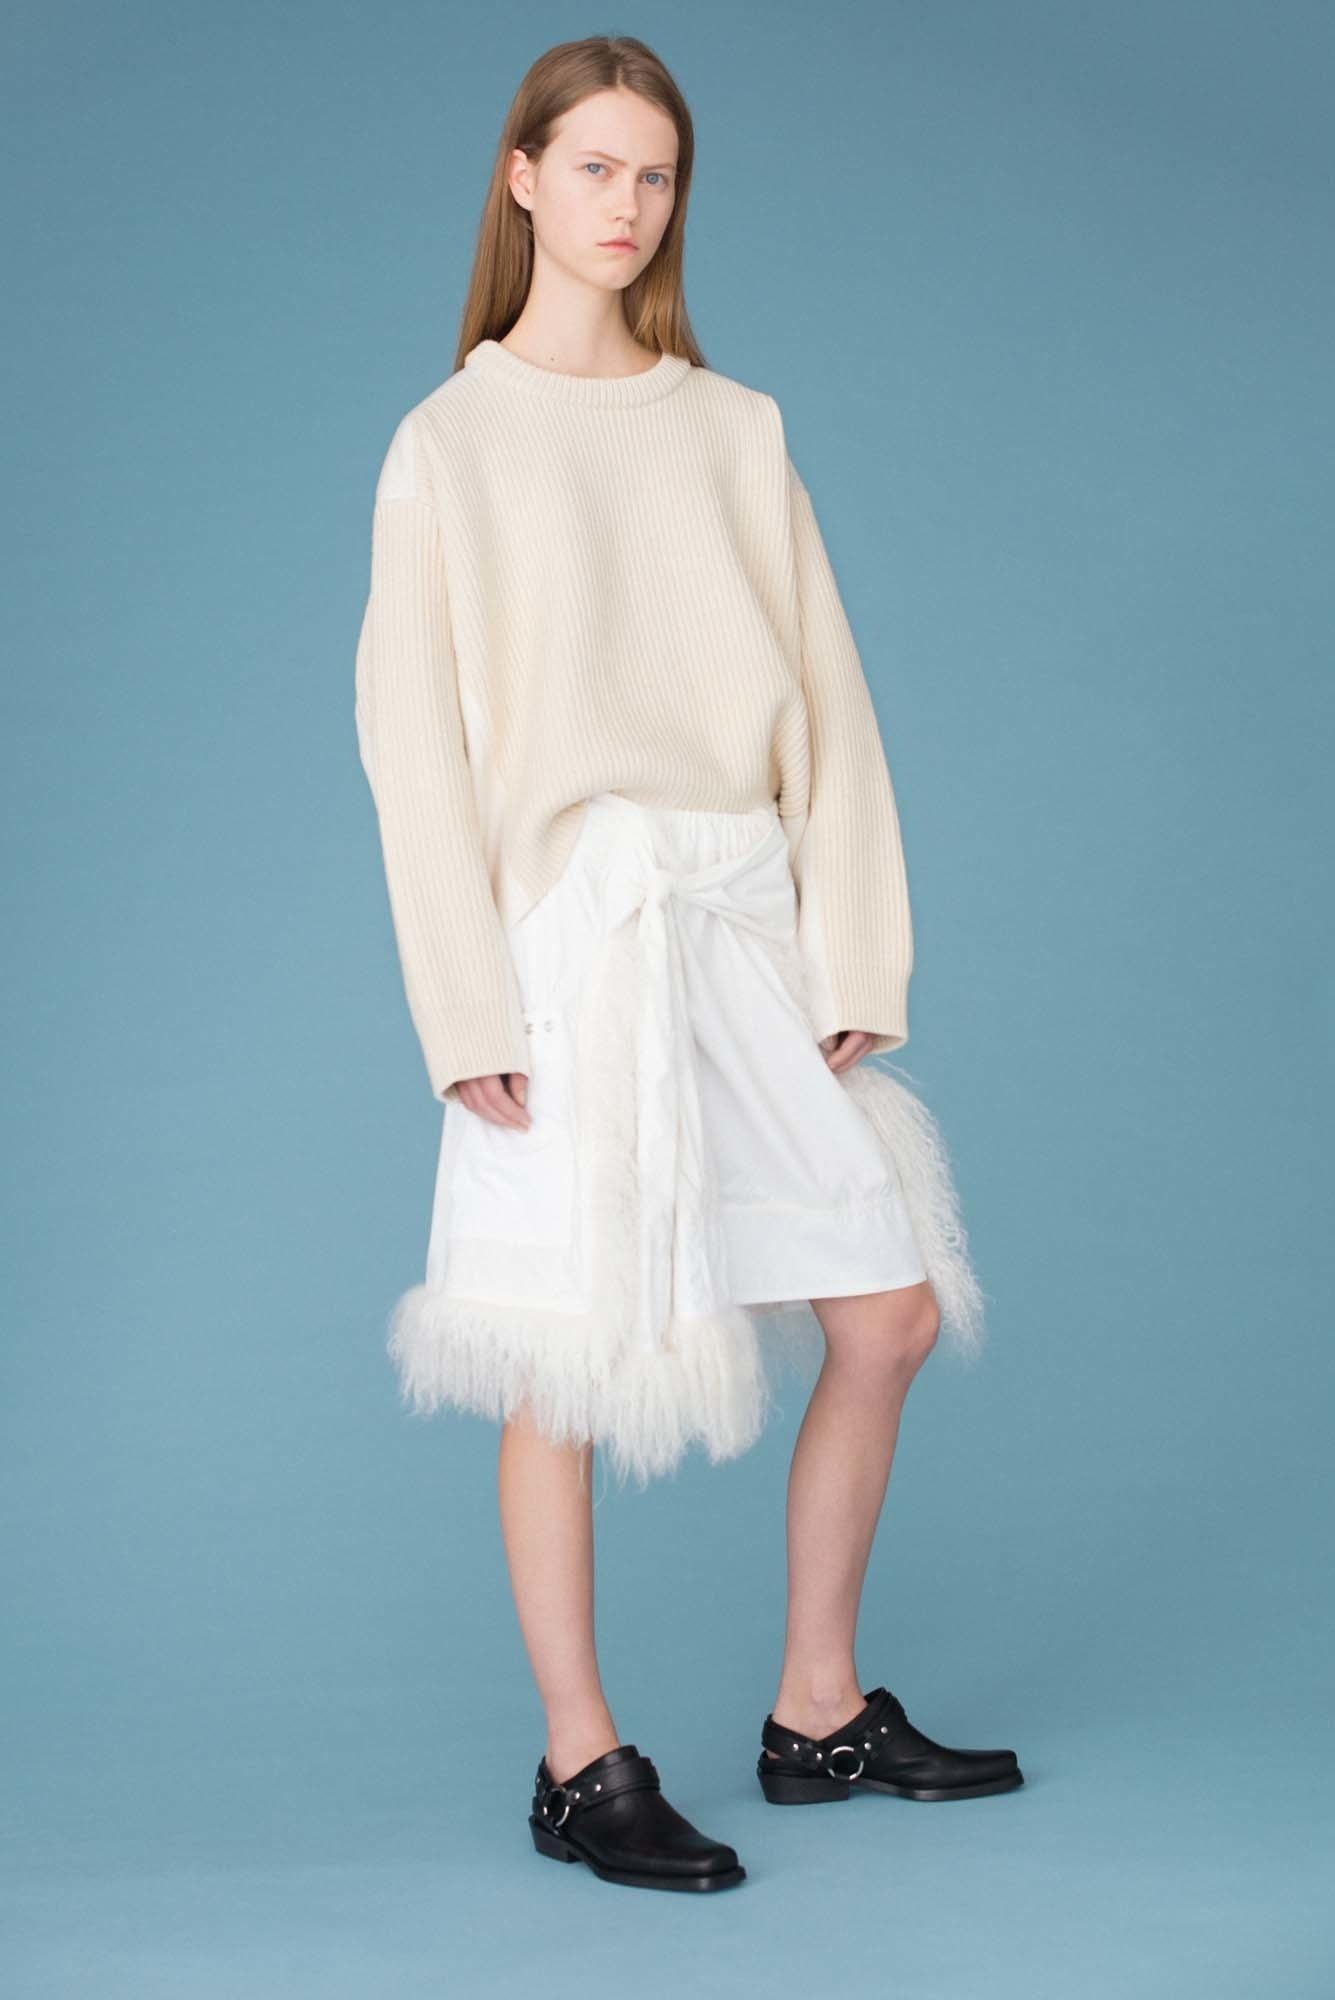 paco-rabanne-pre-fall-2016-fashion-show-the-impression-19